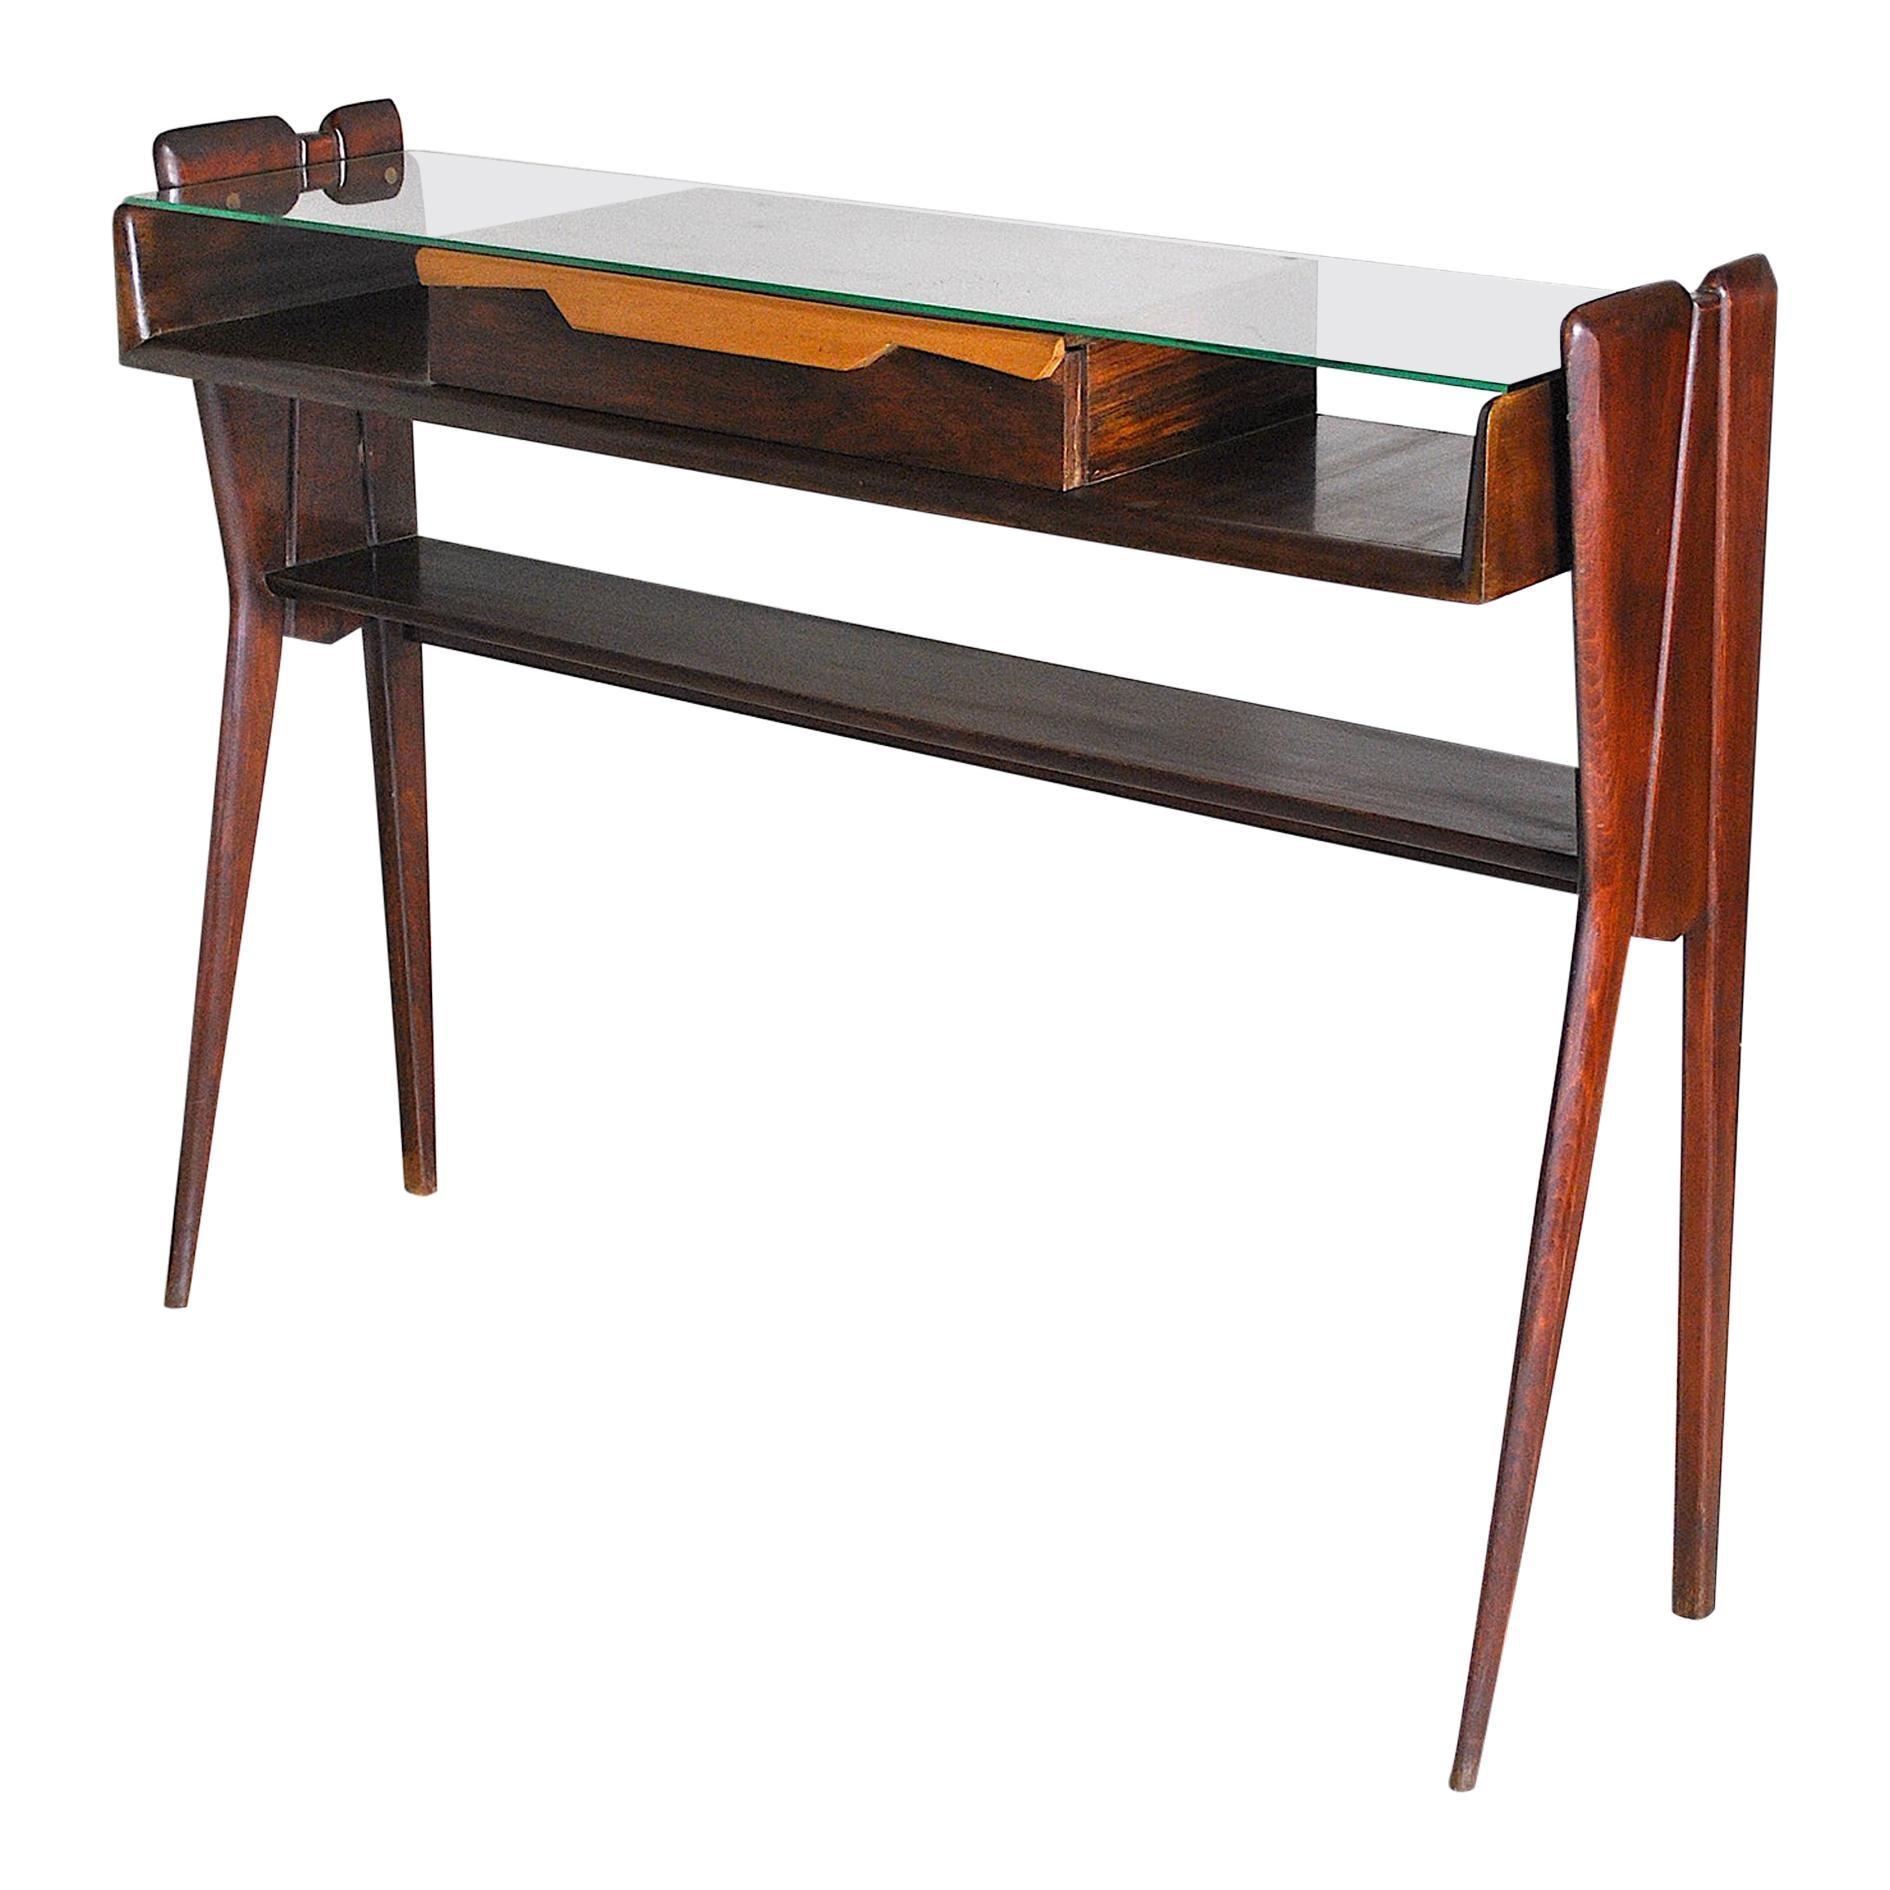 Italian Mid Century Console Table Late 50's Ico Parisi Style